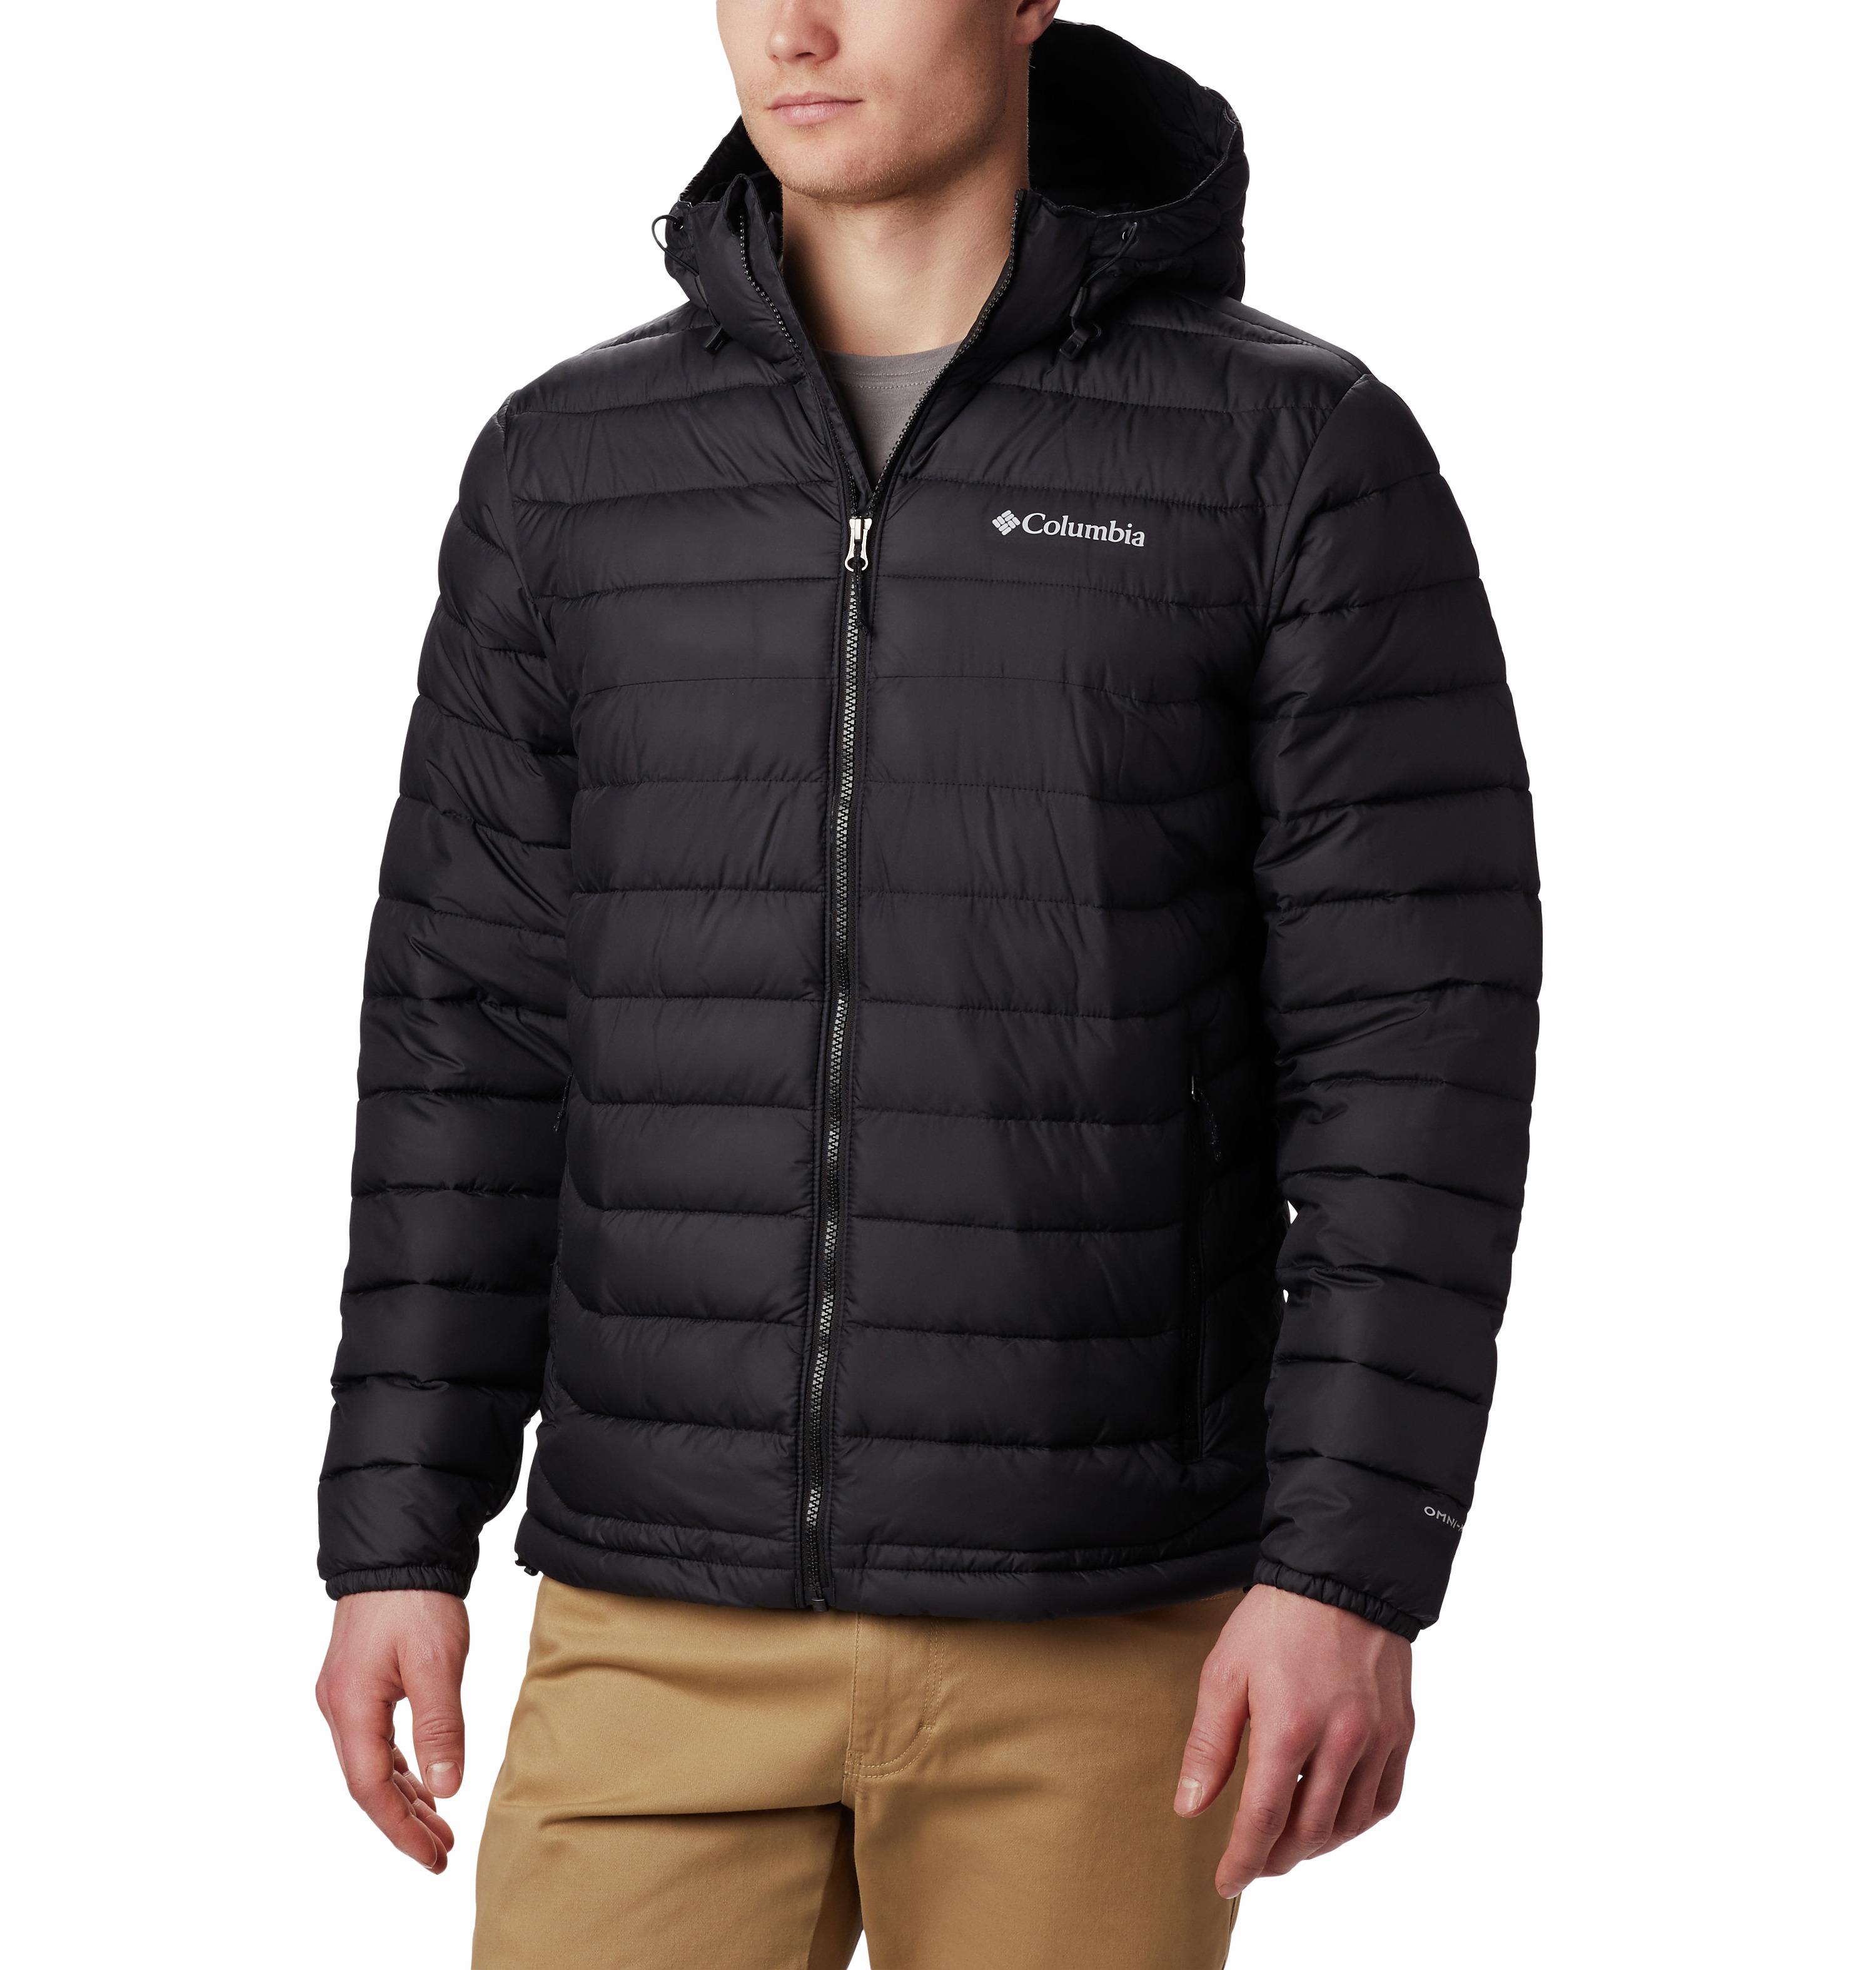 Columbia Powder Lite Hooded Jacket - Doudoune homme